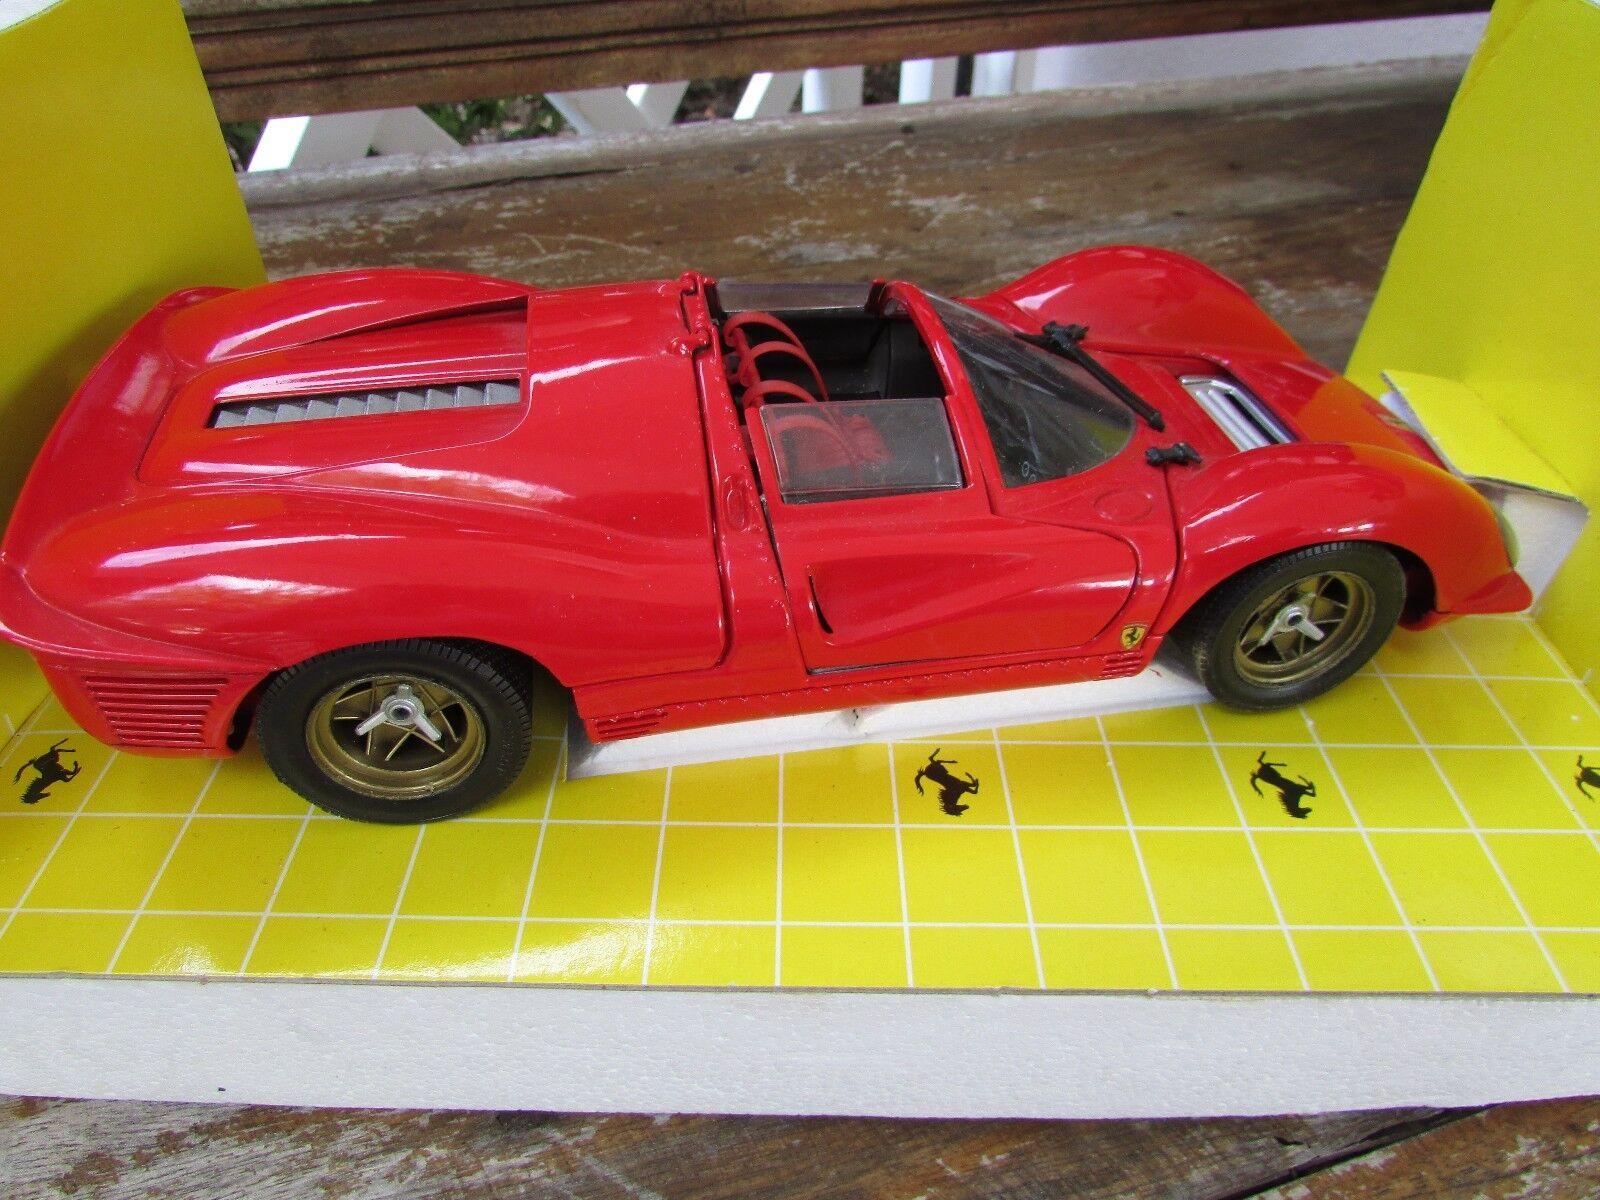 1967 Ferrari 330 P4 puede am coche de carreras Jouef Evolution 1 18 Limited Edit V12 Italia